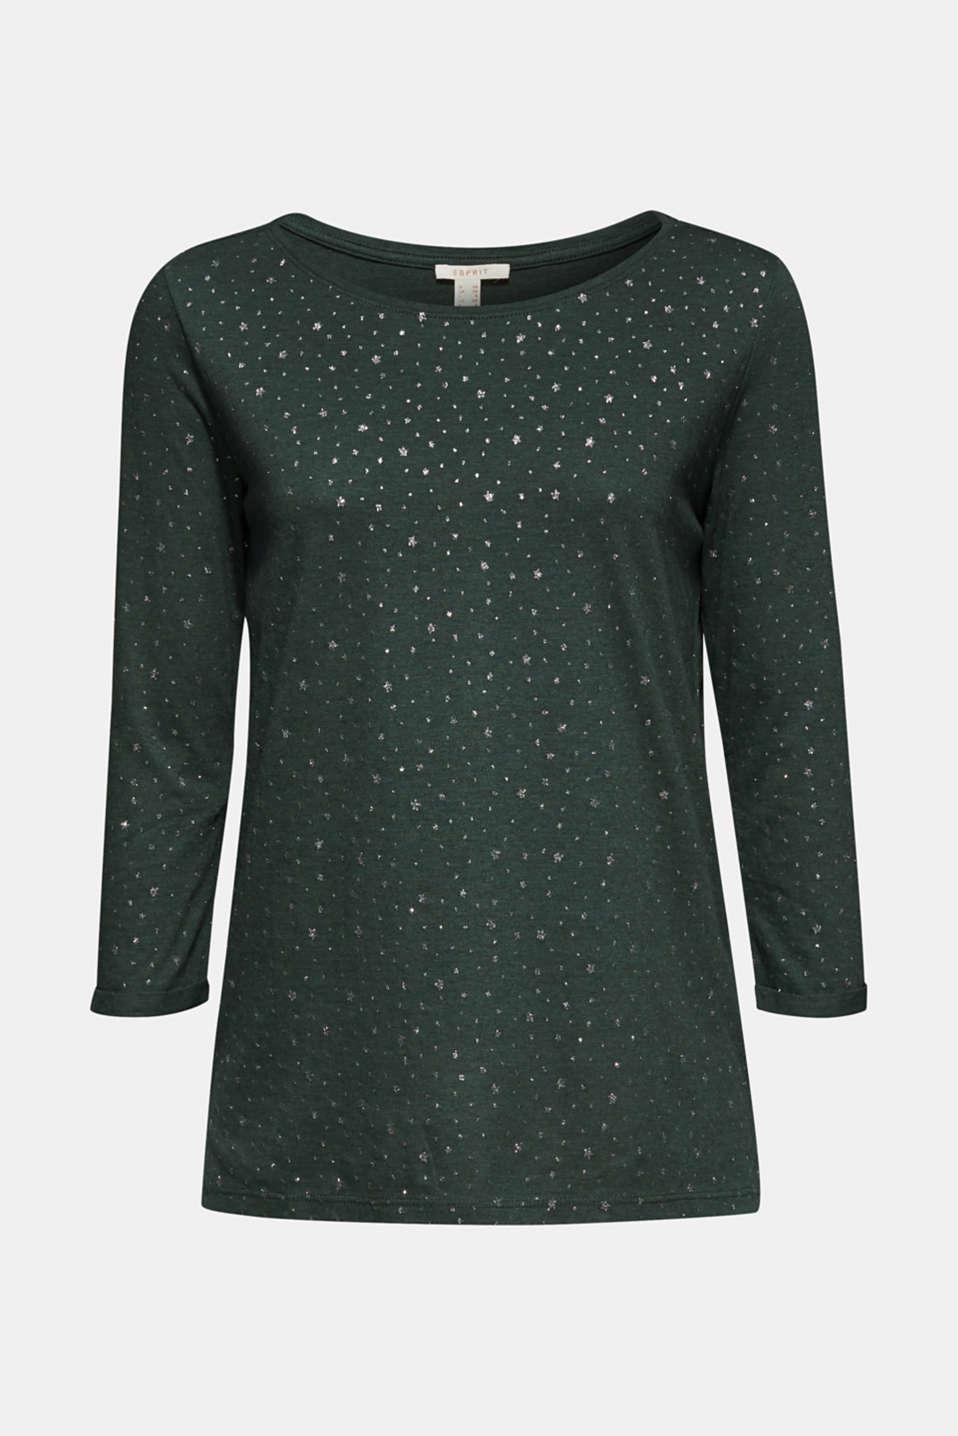 T-Shirts, BOTTLE GREEN 5, detail image number 8